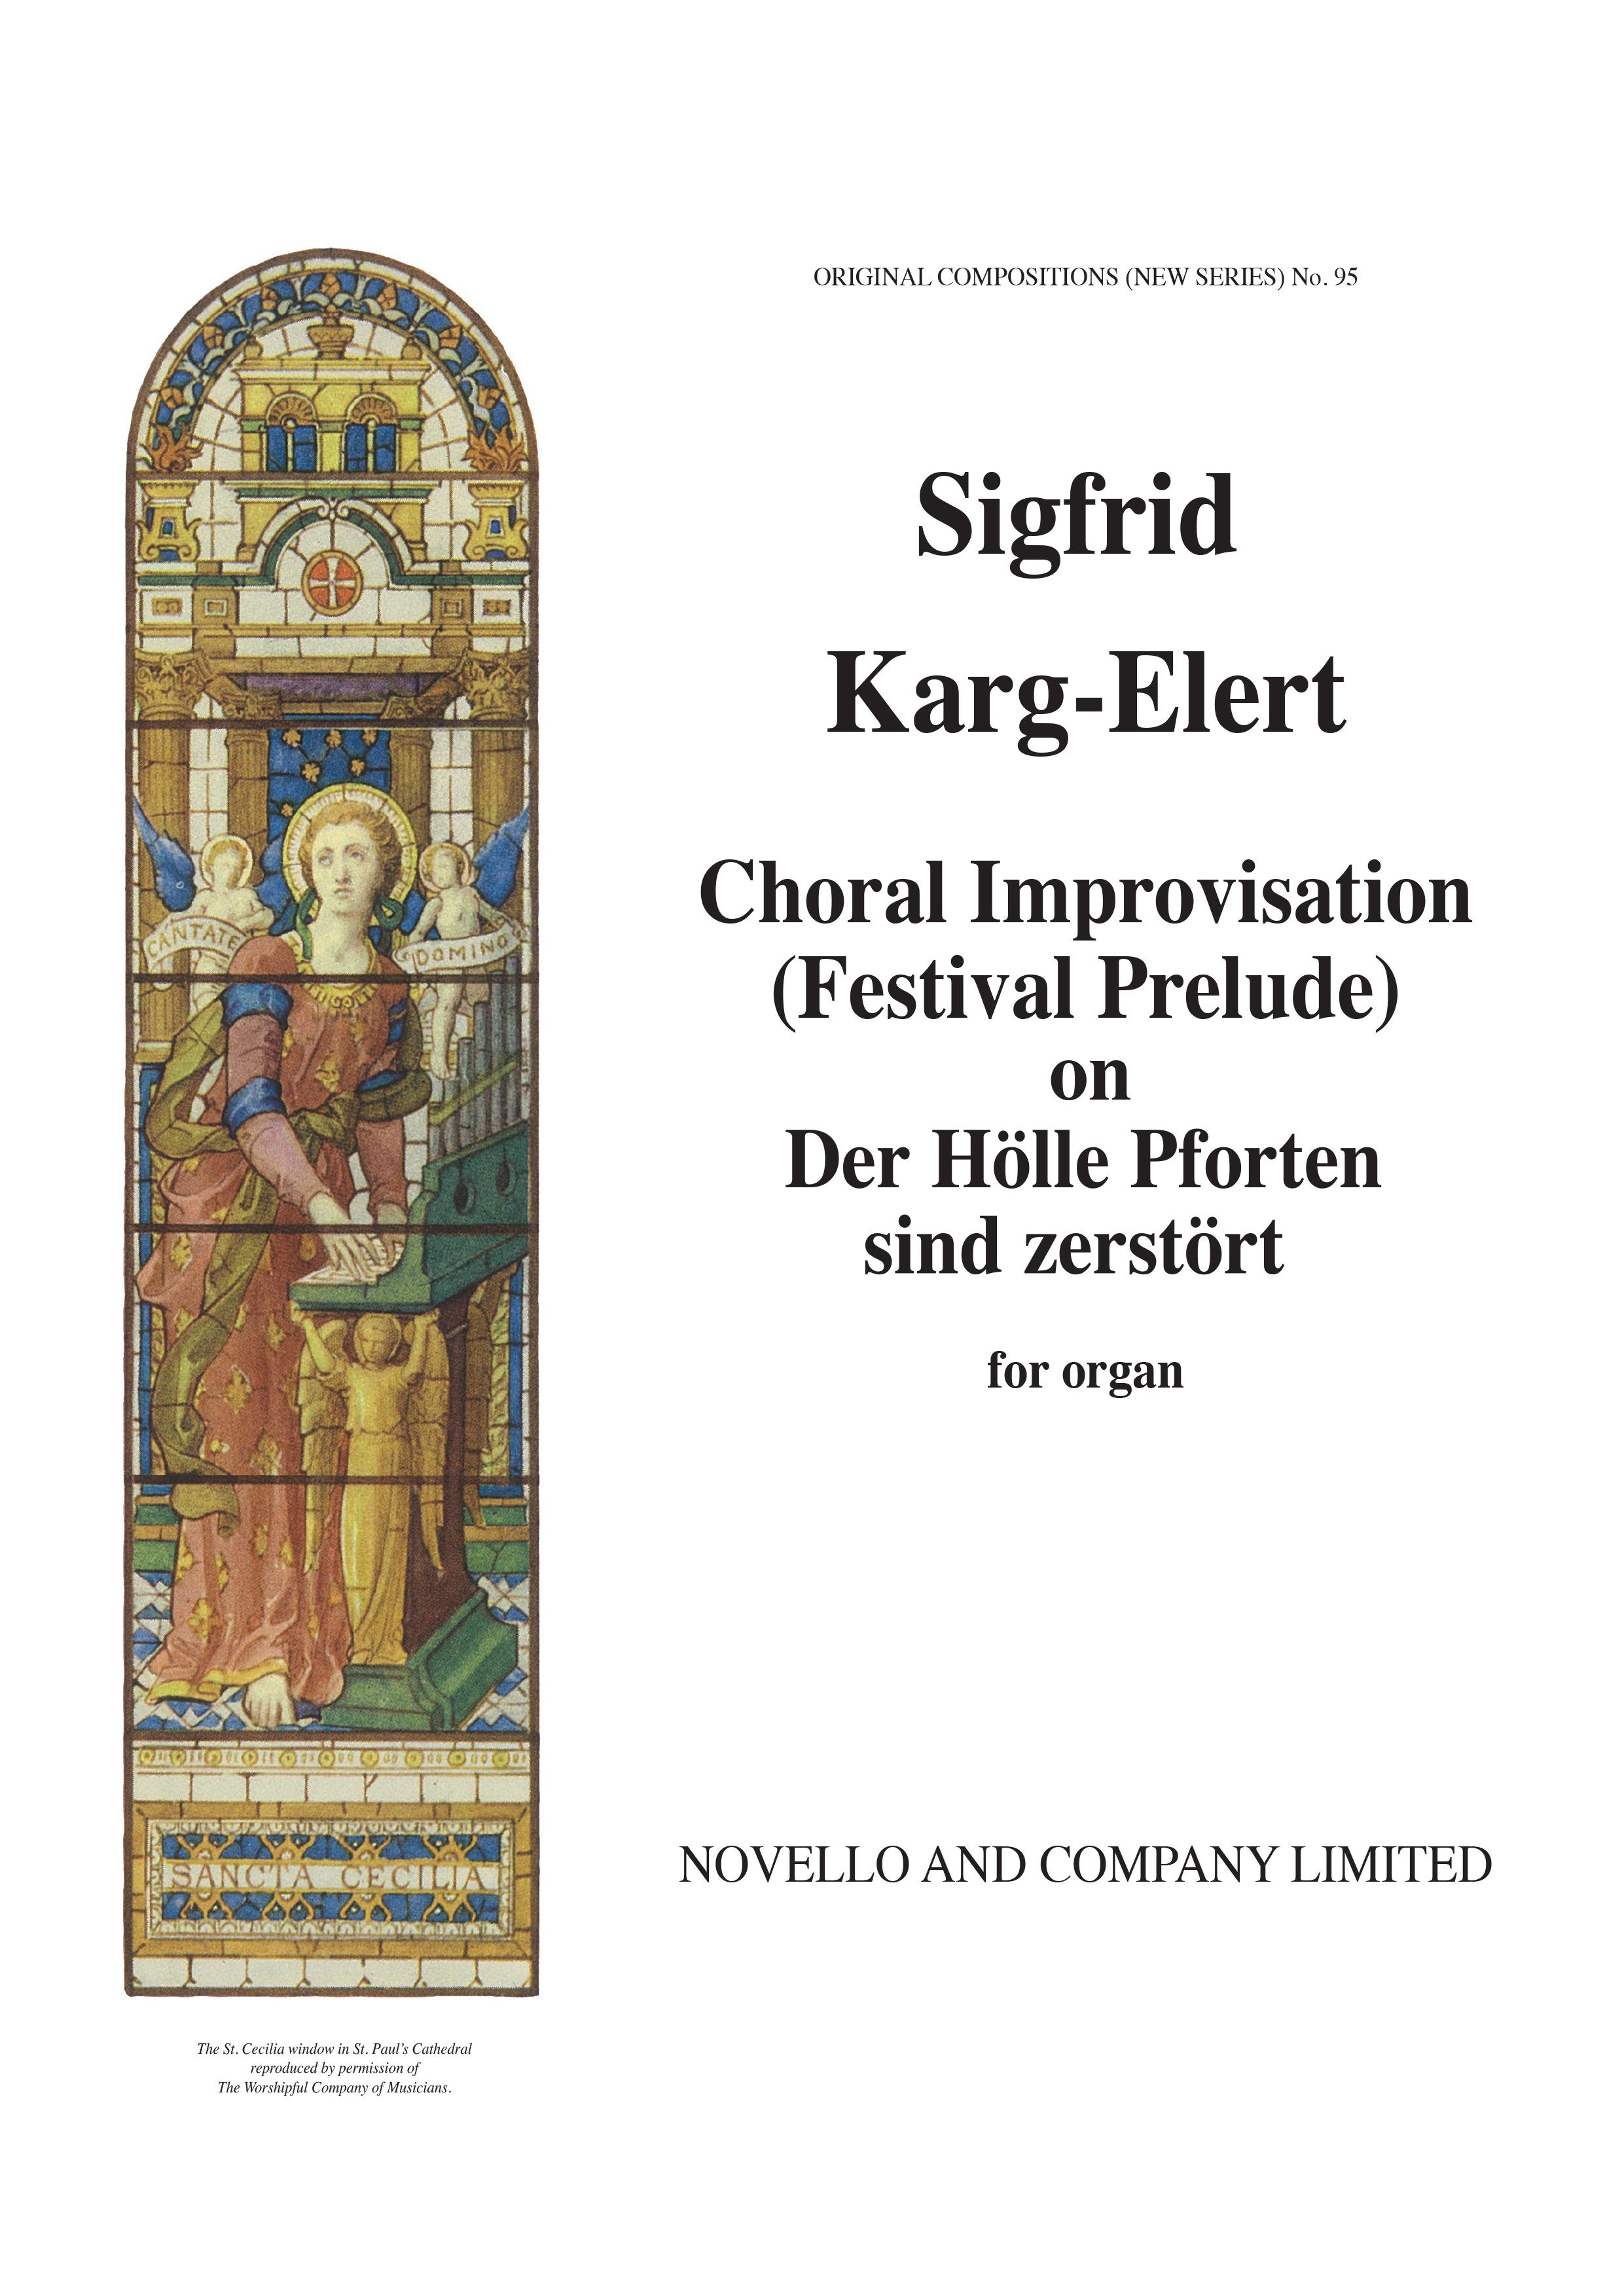 Sigfrid Karg-Elert: Choral Improvisation: Organ: Instrumental Work